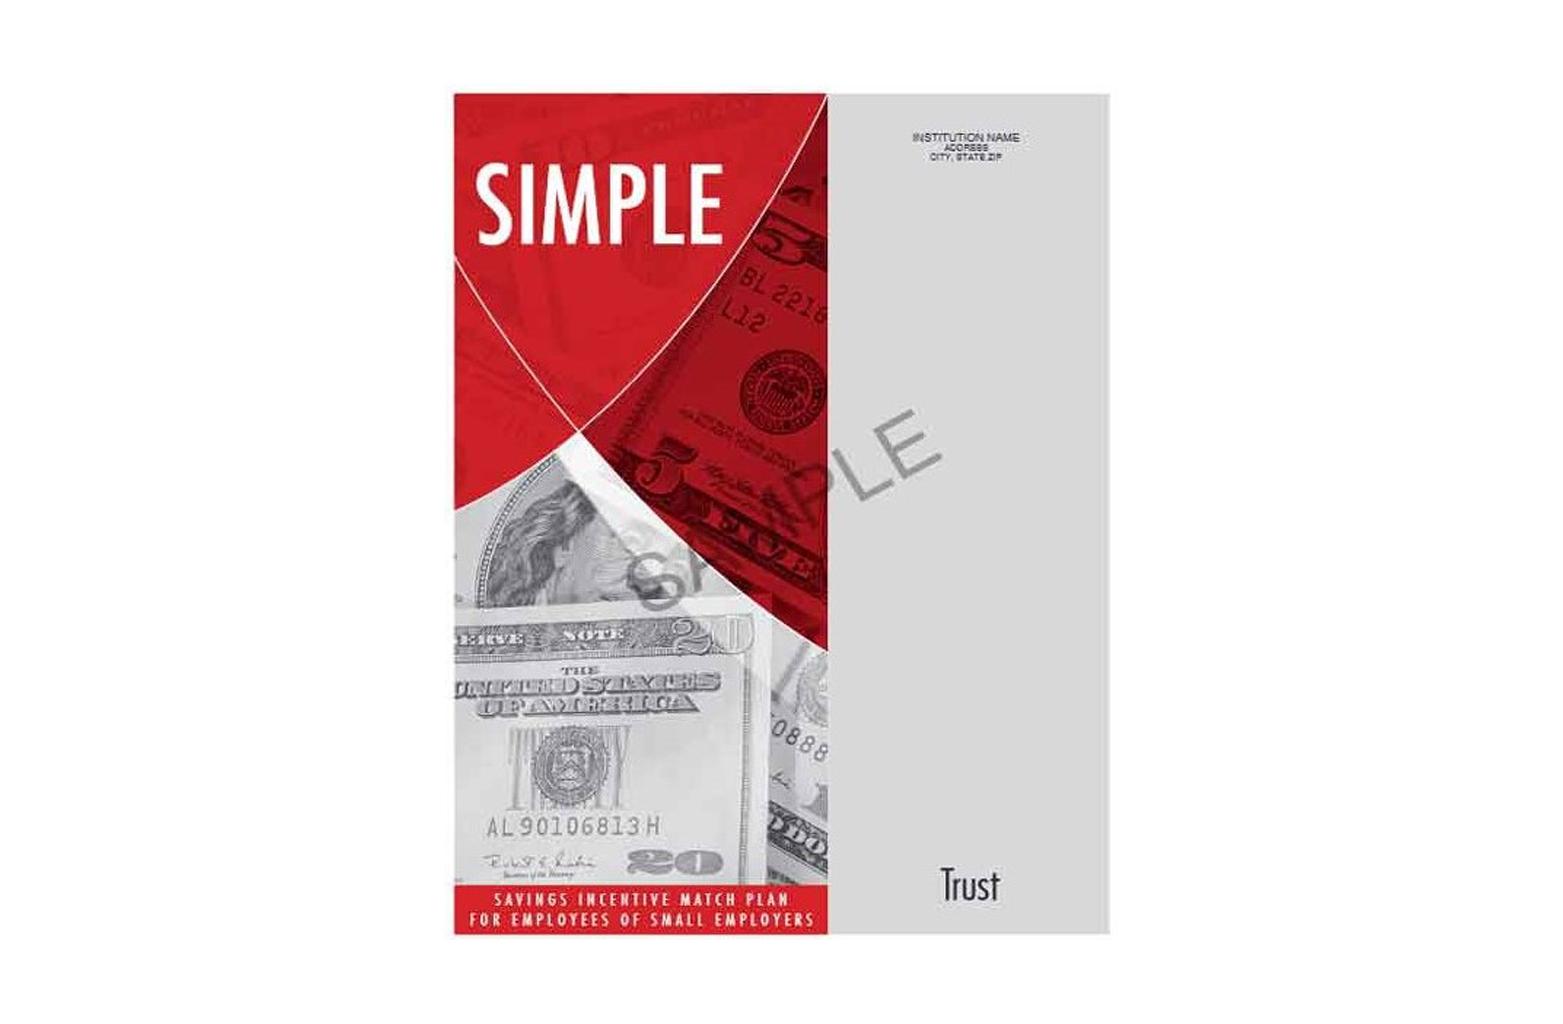 SIMPLE IRA organiser - trust sample